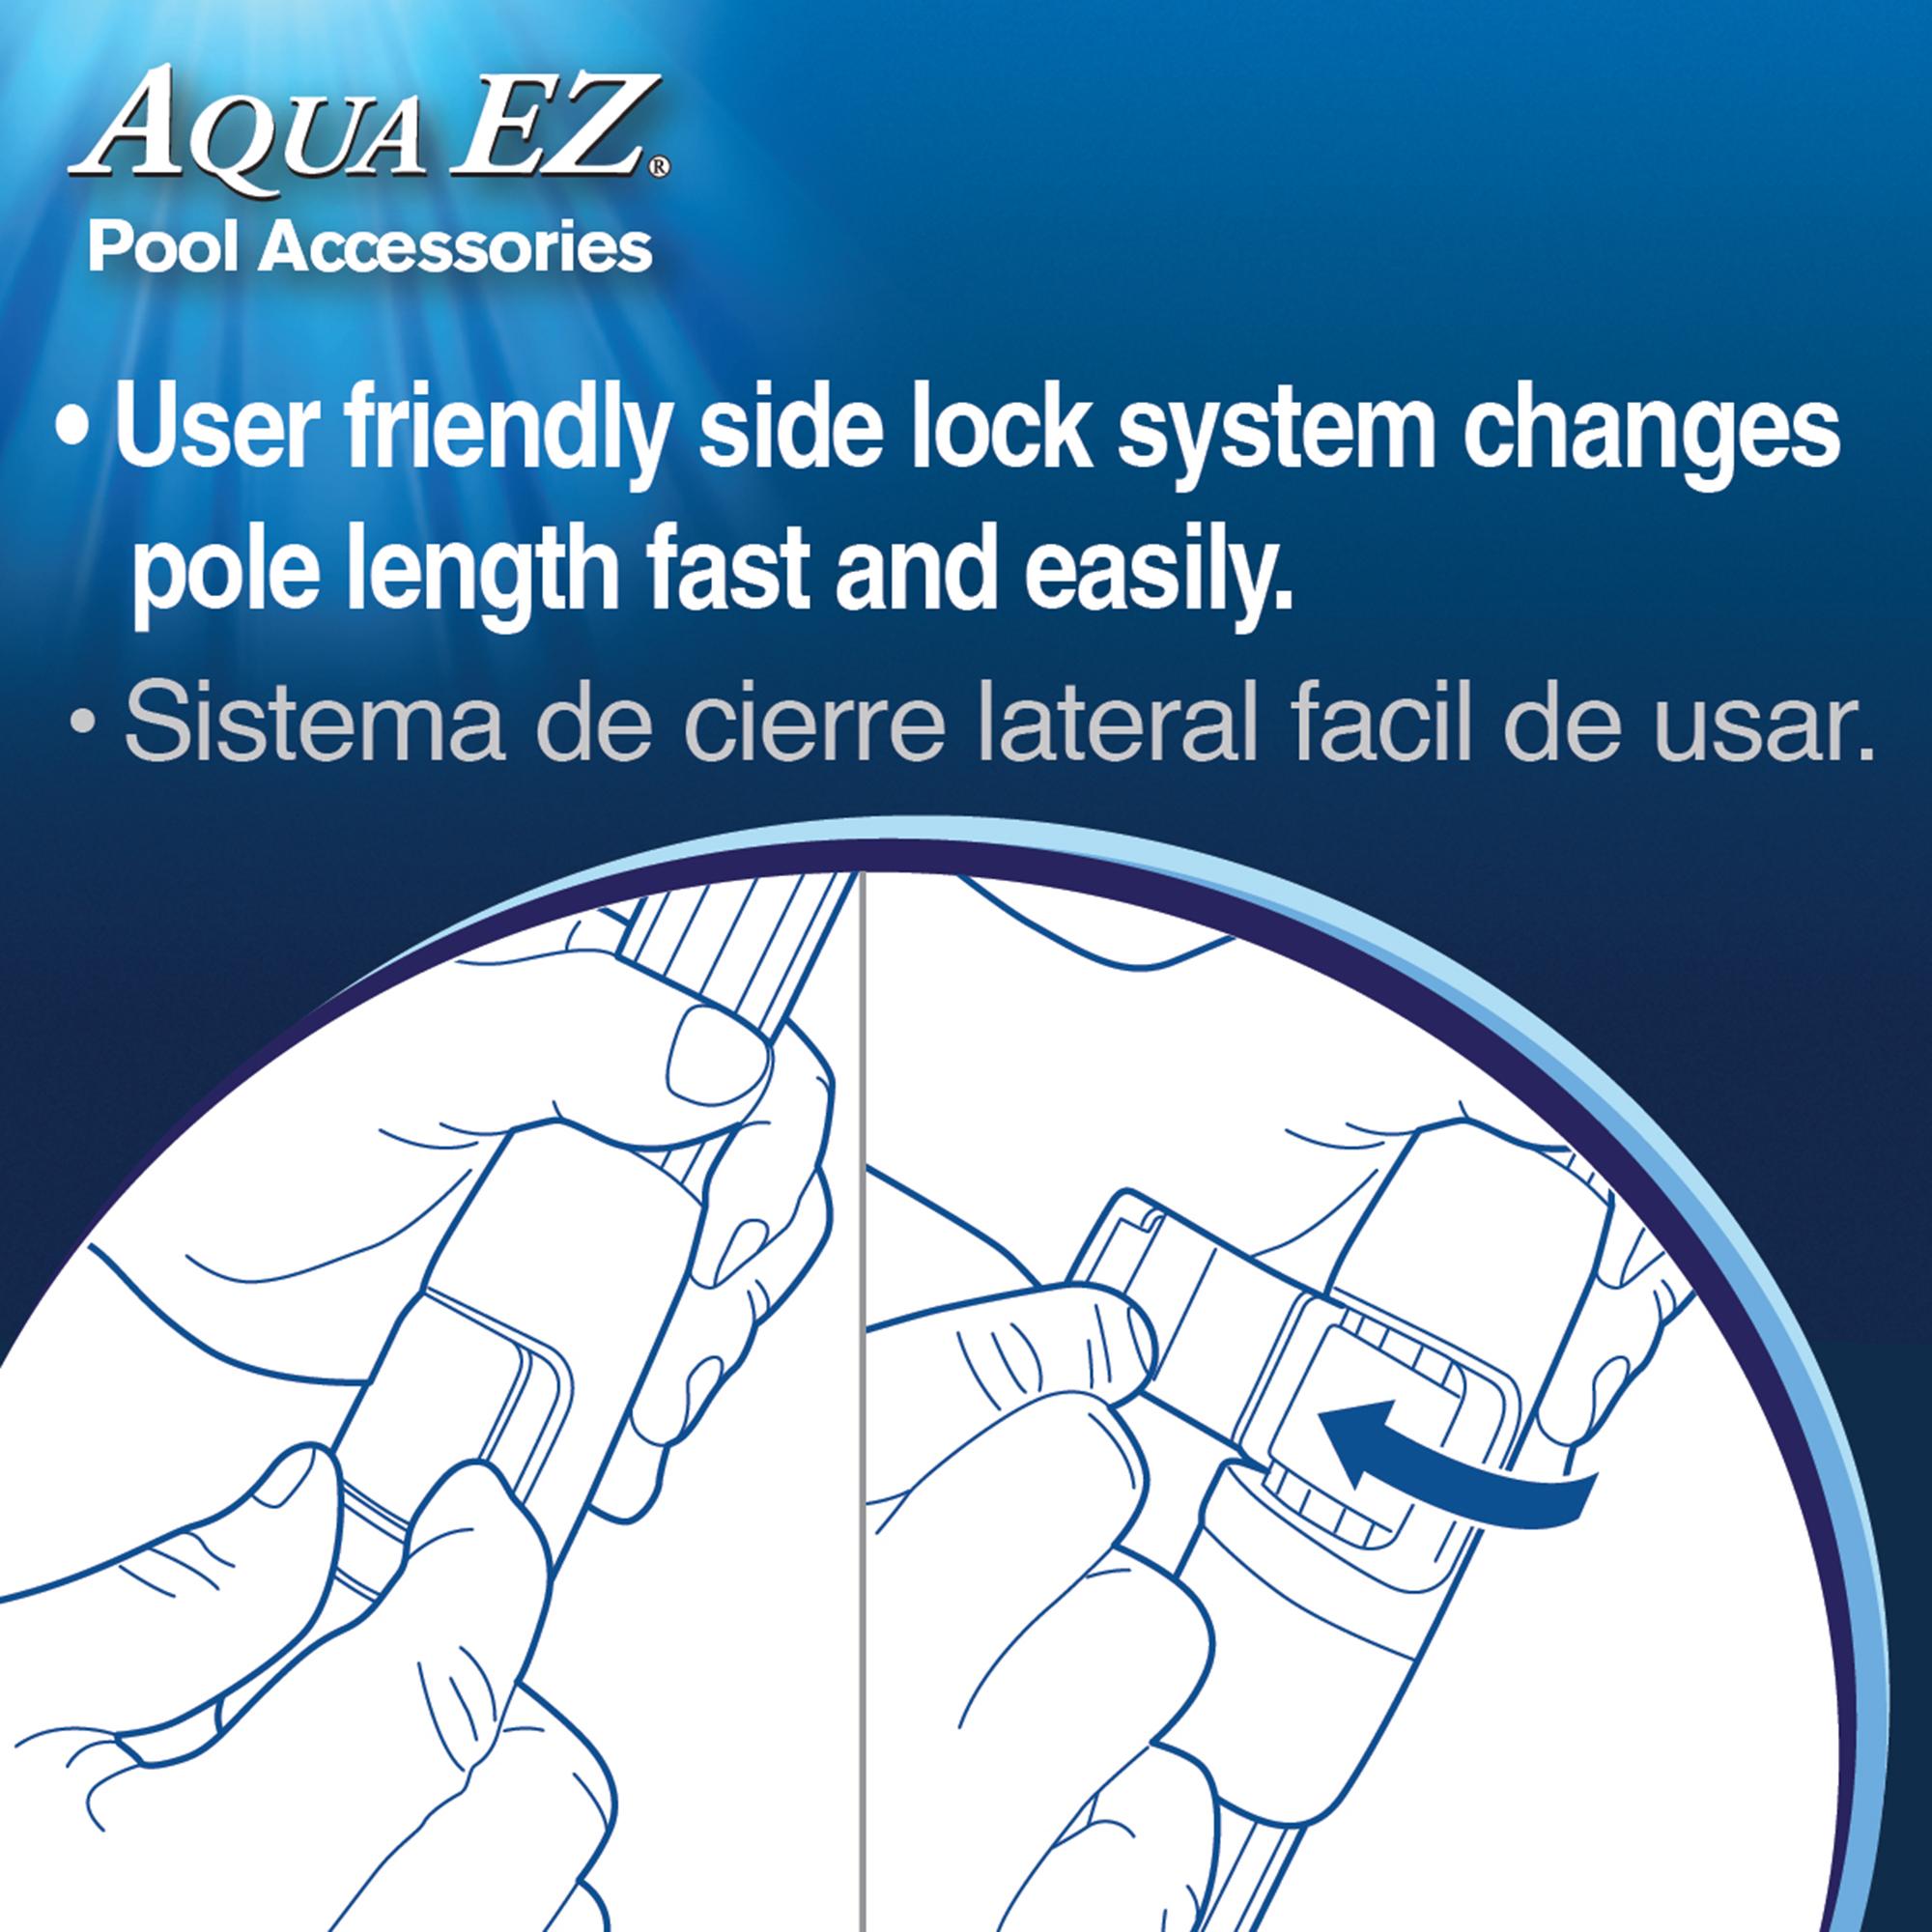 Aqua EZ 2-piece telescopic 16 ft Aluminum Pool Pole at Lowes com